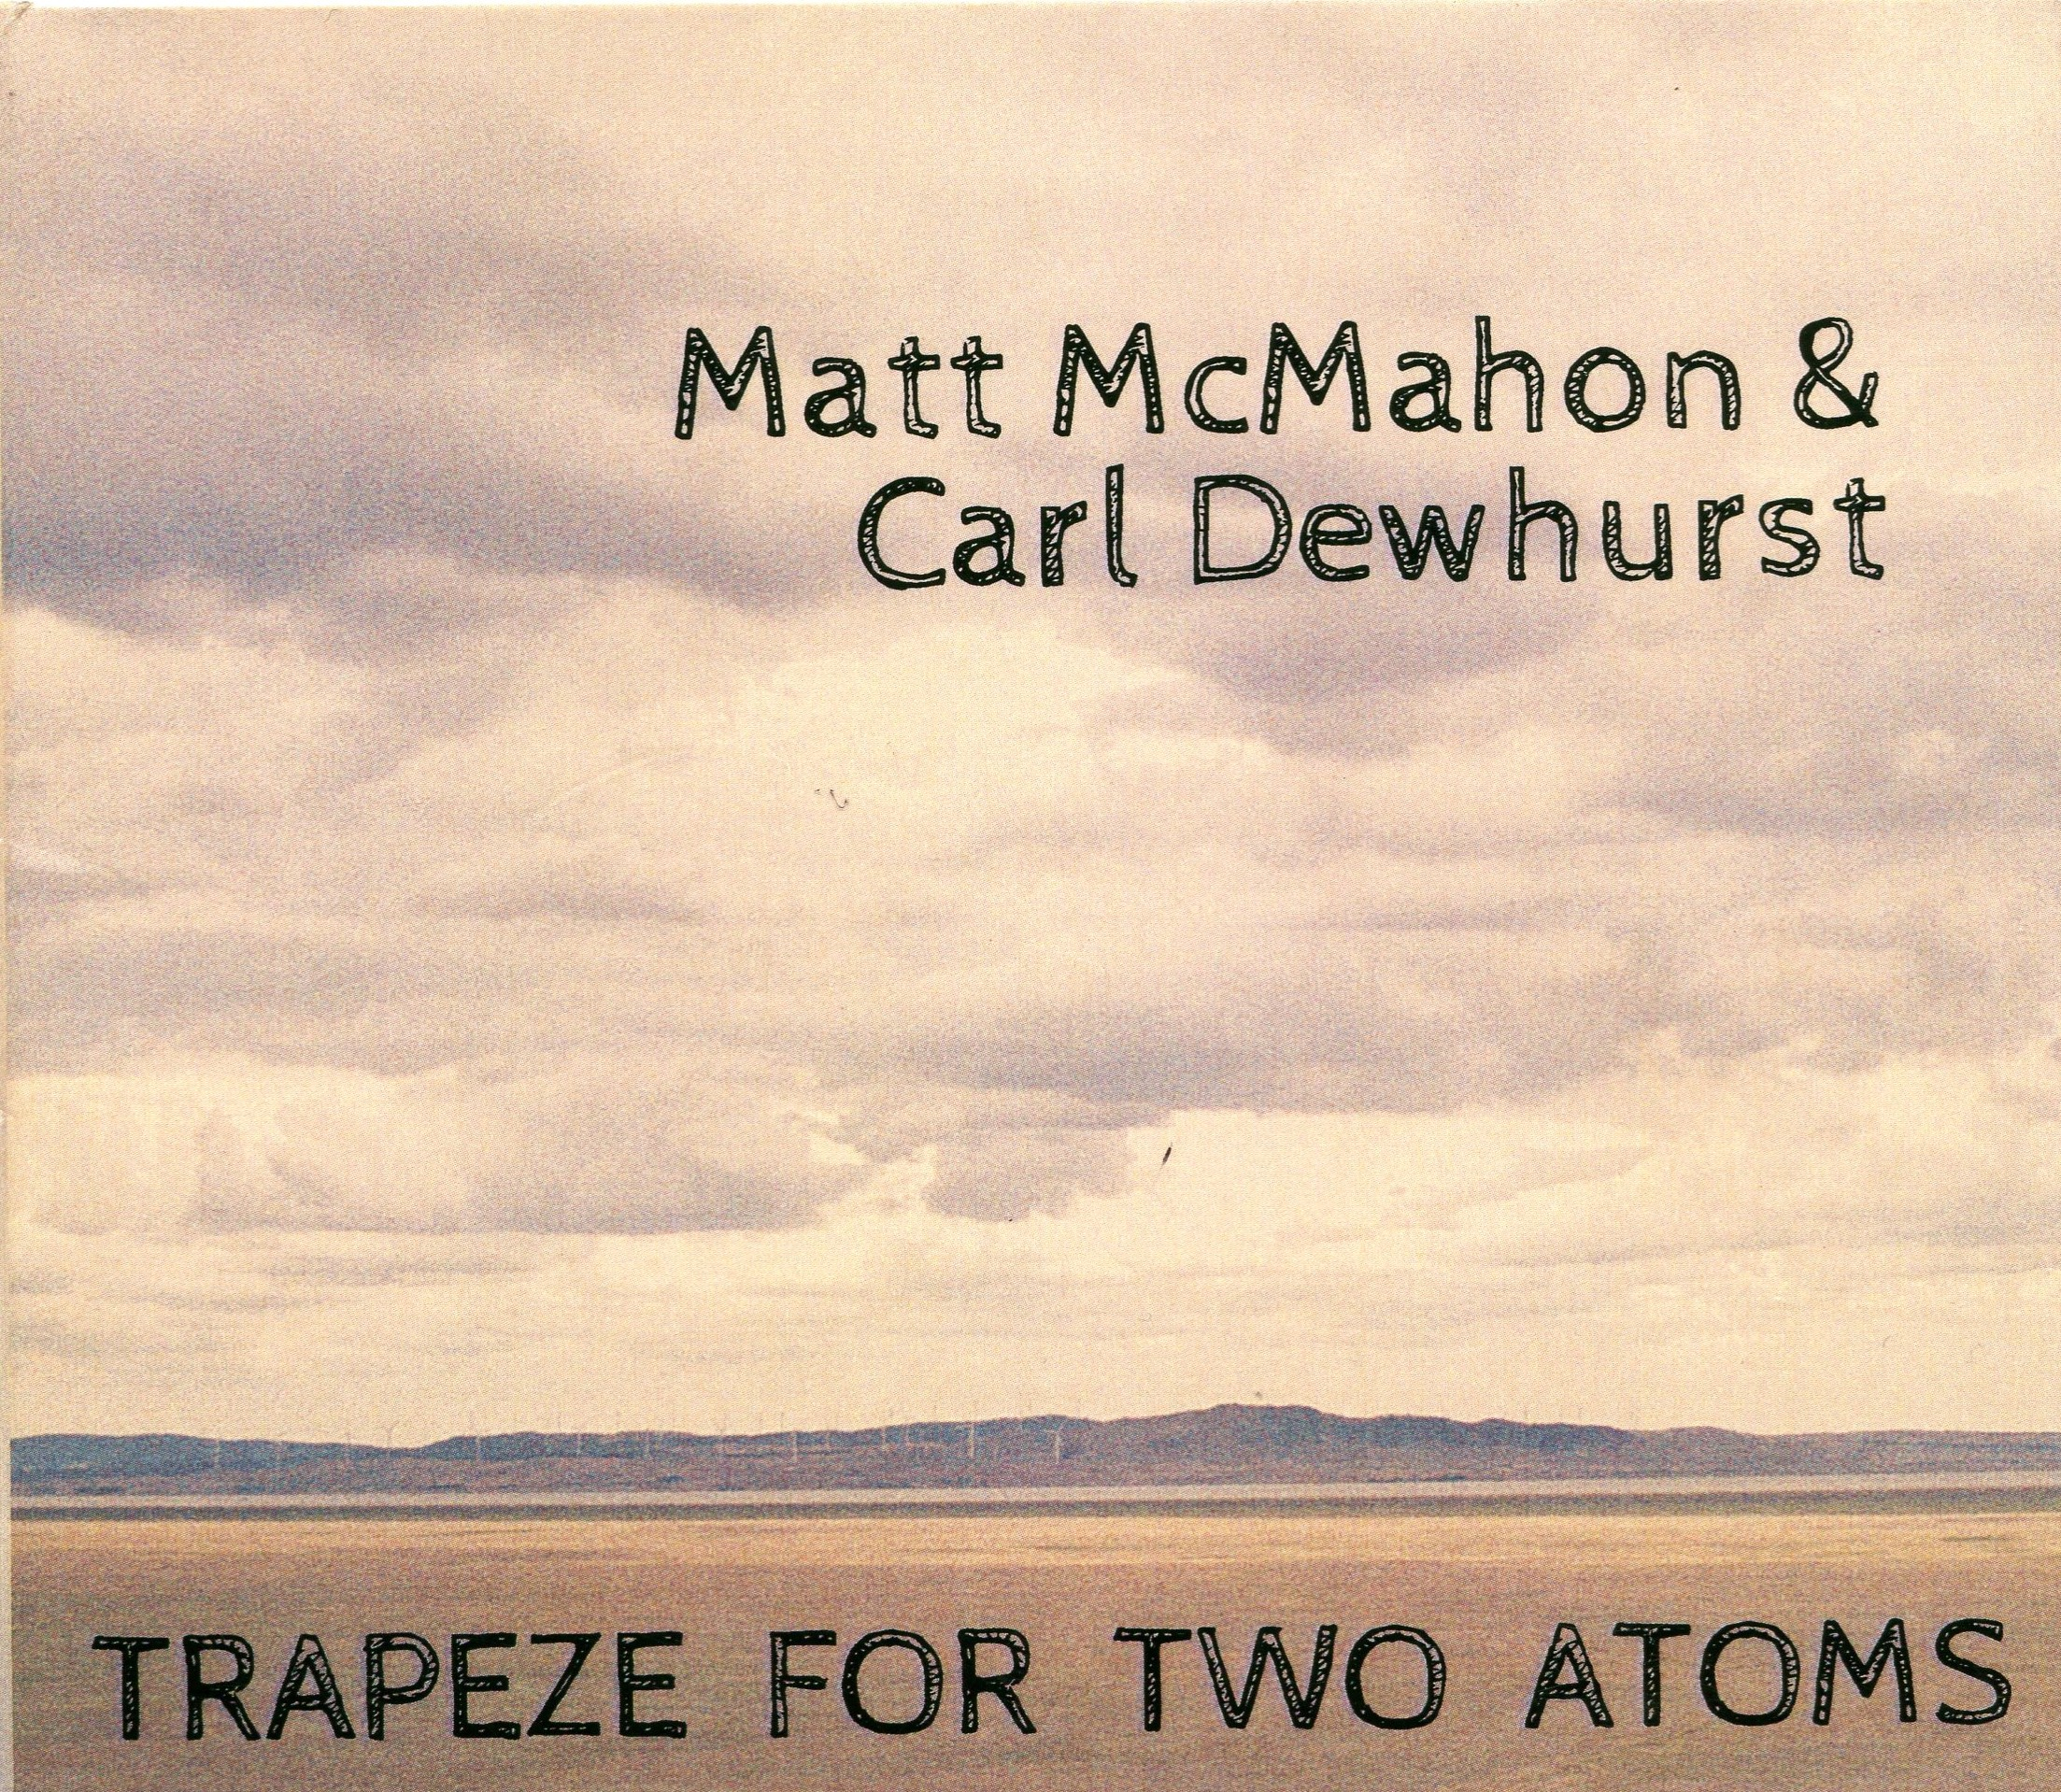 McMahonMattCarlDewhurstTrapezeForTwoAtomsCover - Copy (2).jpg